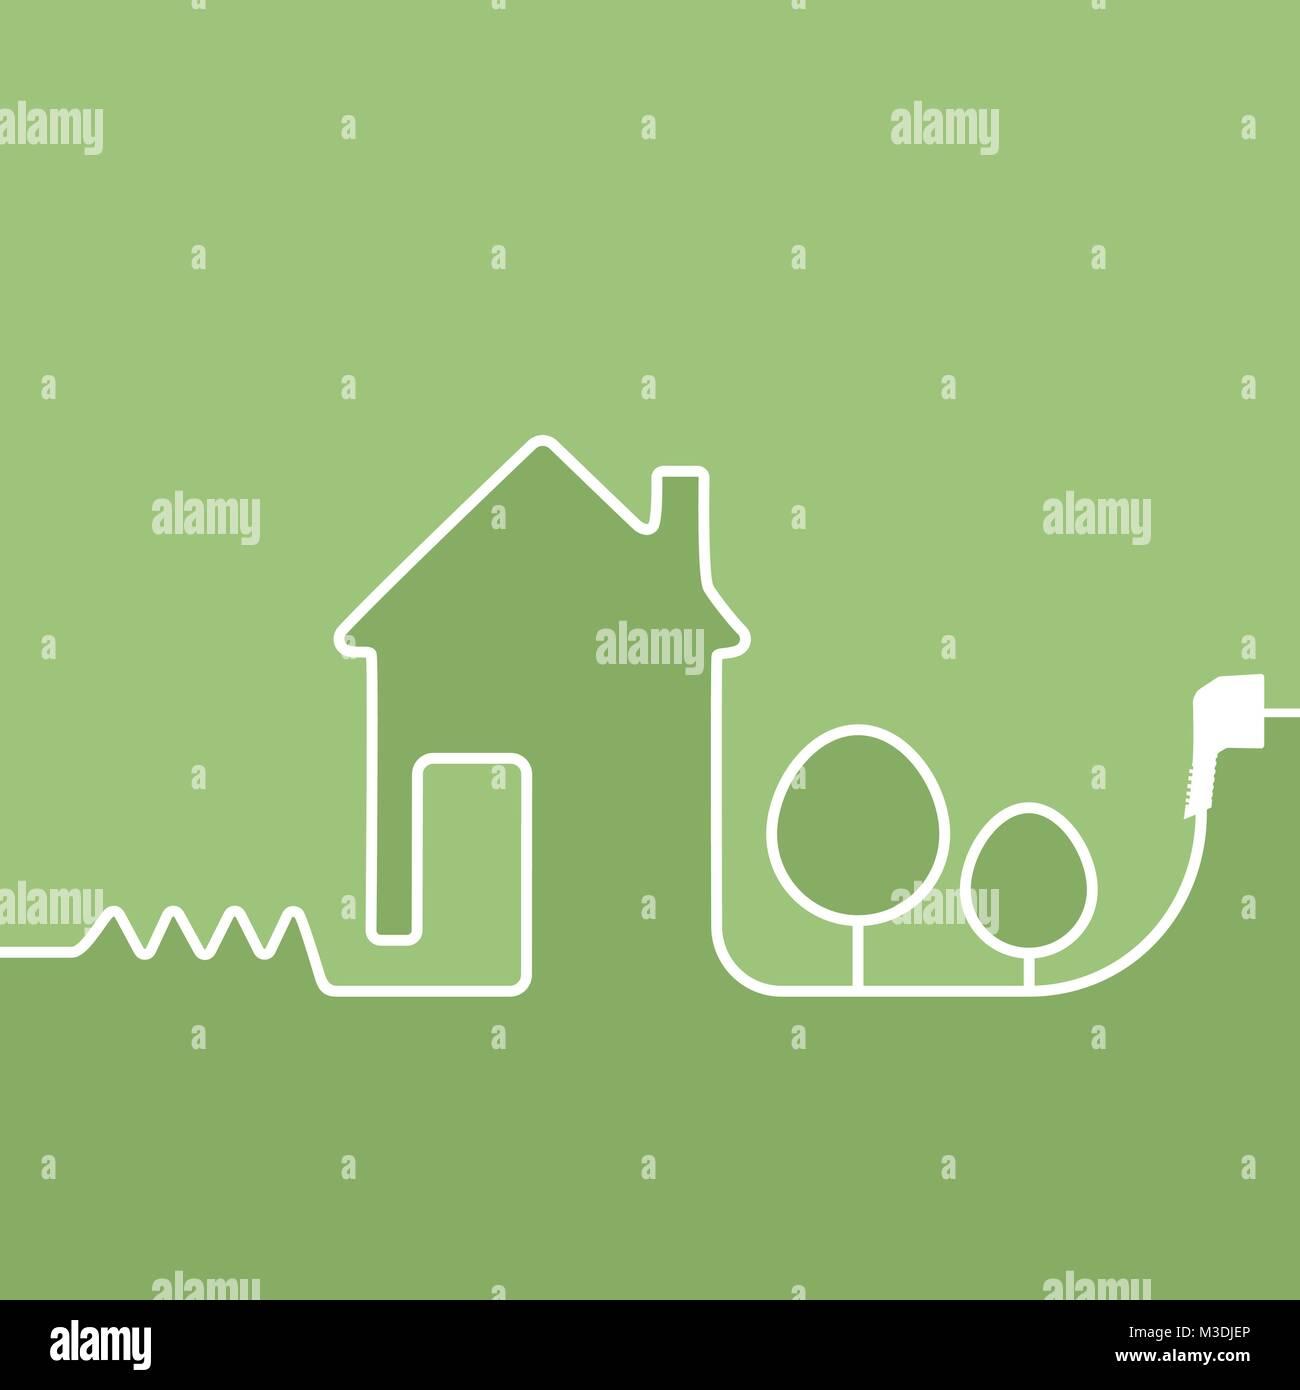 Wire Electric Plug Vector Design Stockfotos & Wire Electric Plug ...